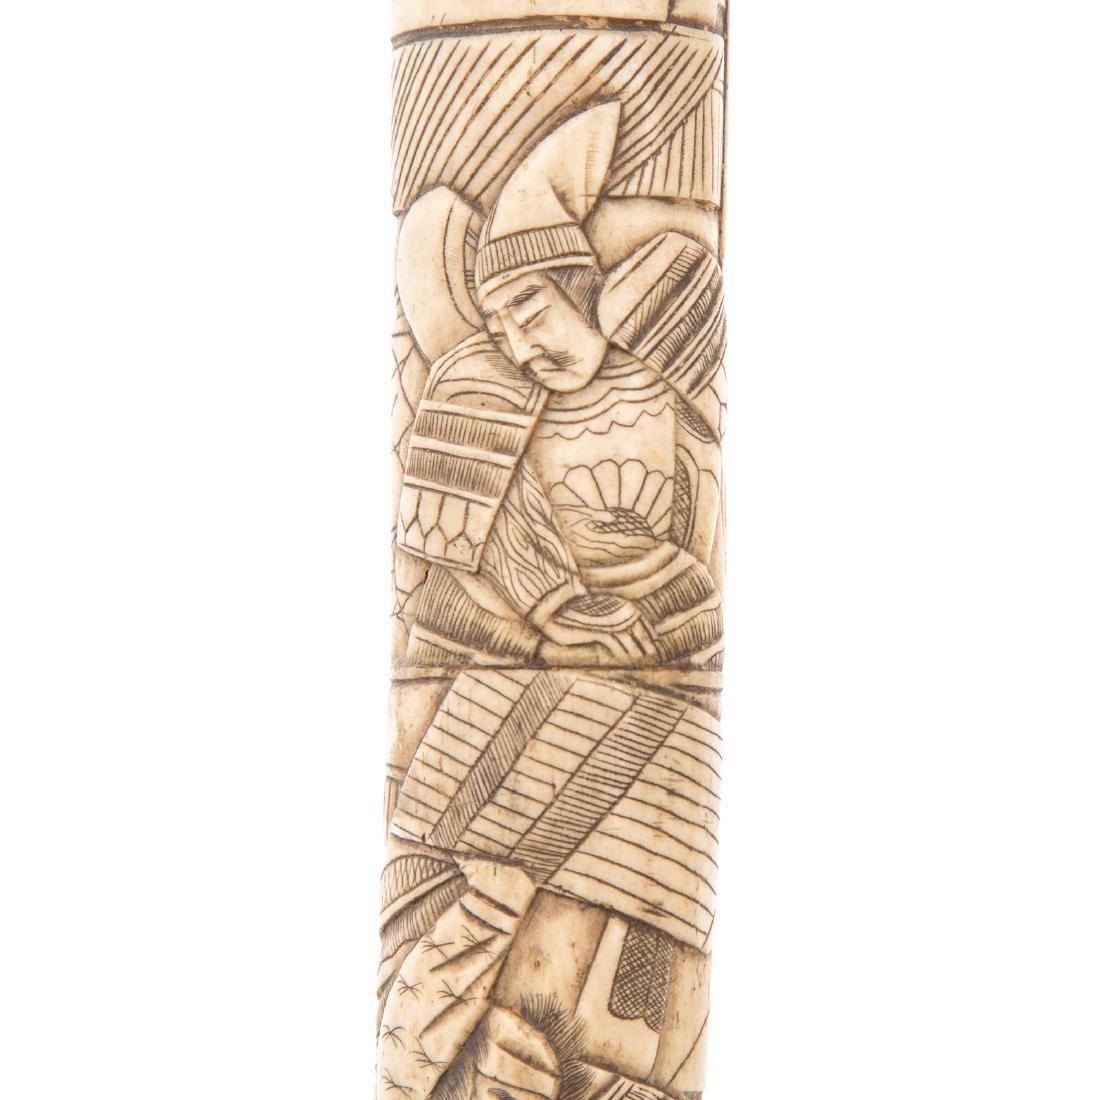 Japanese carved ox bone sword - 6